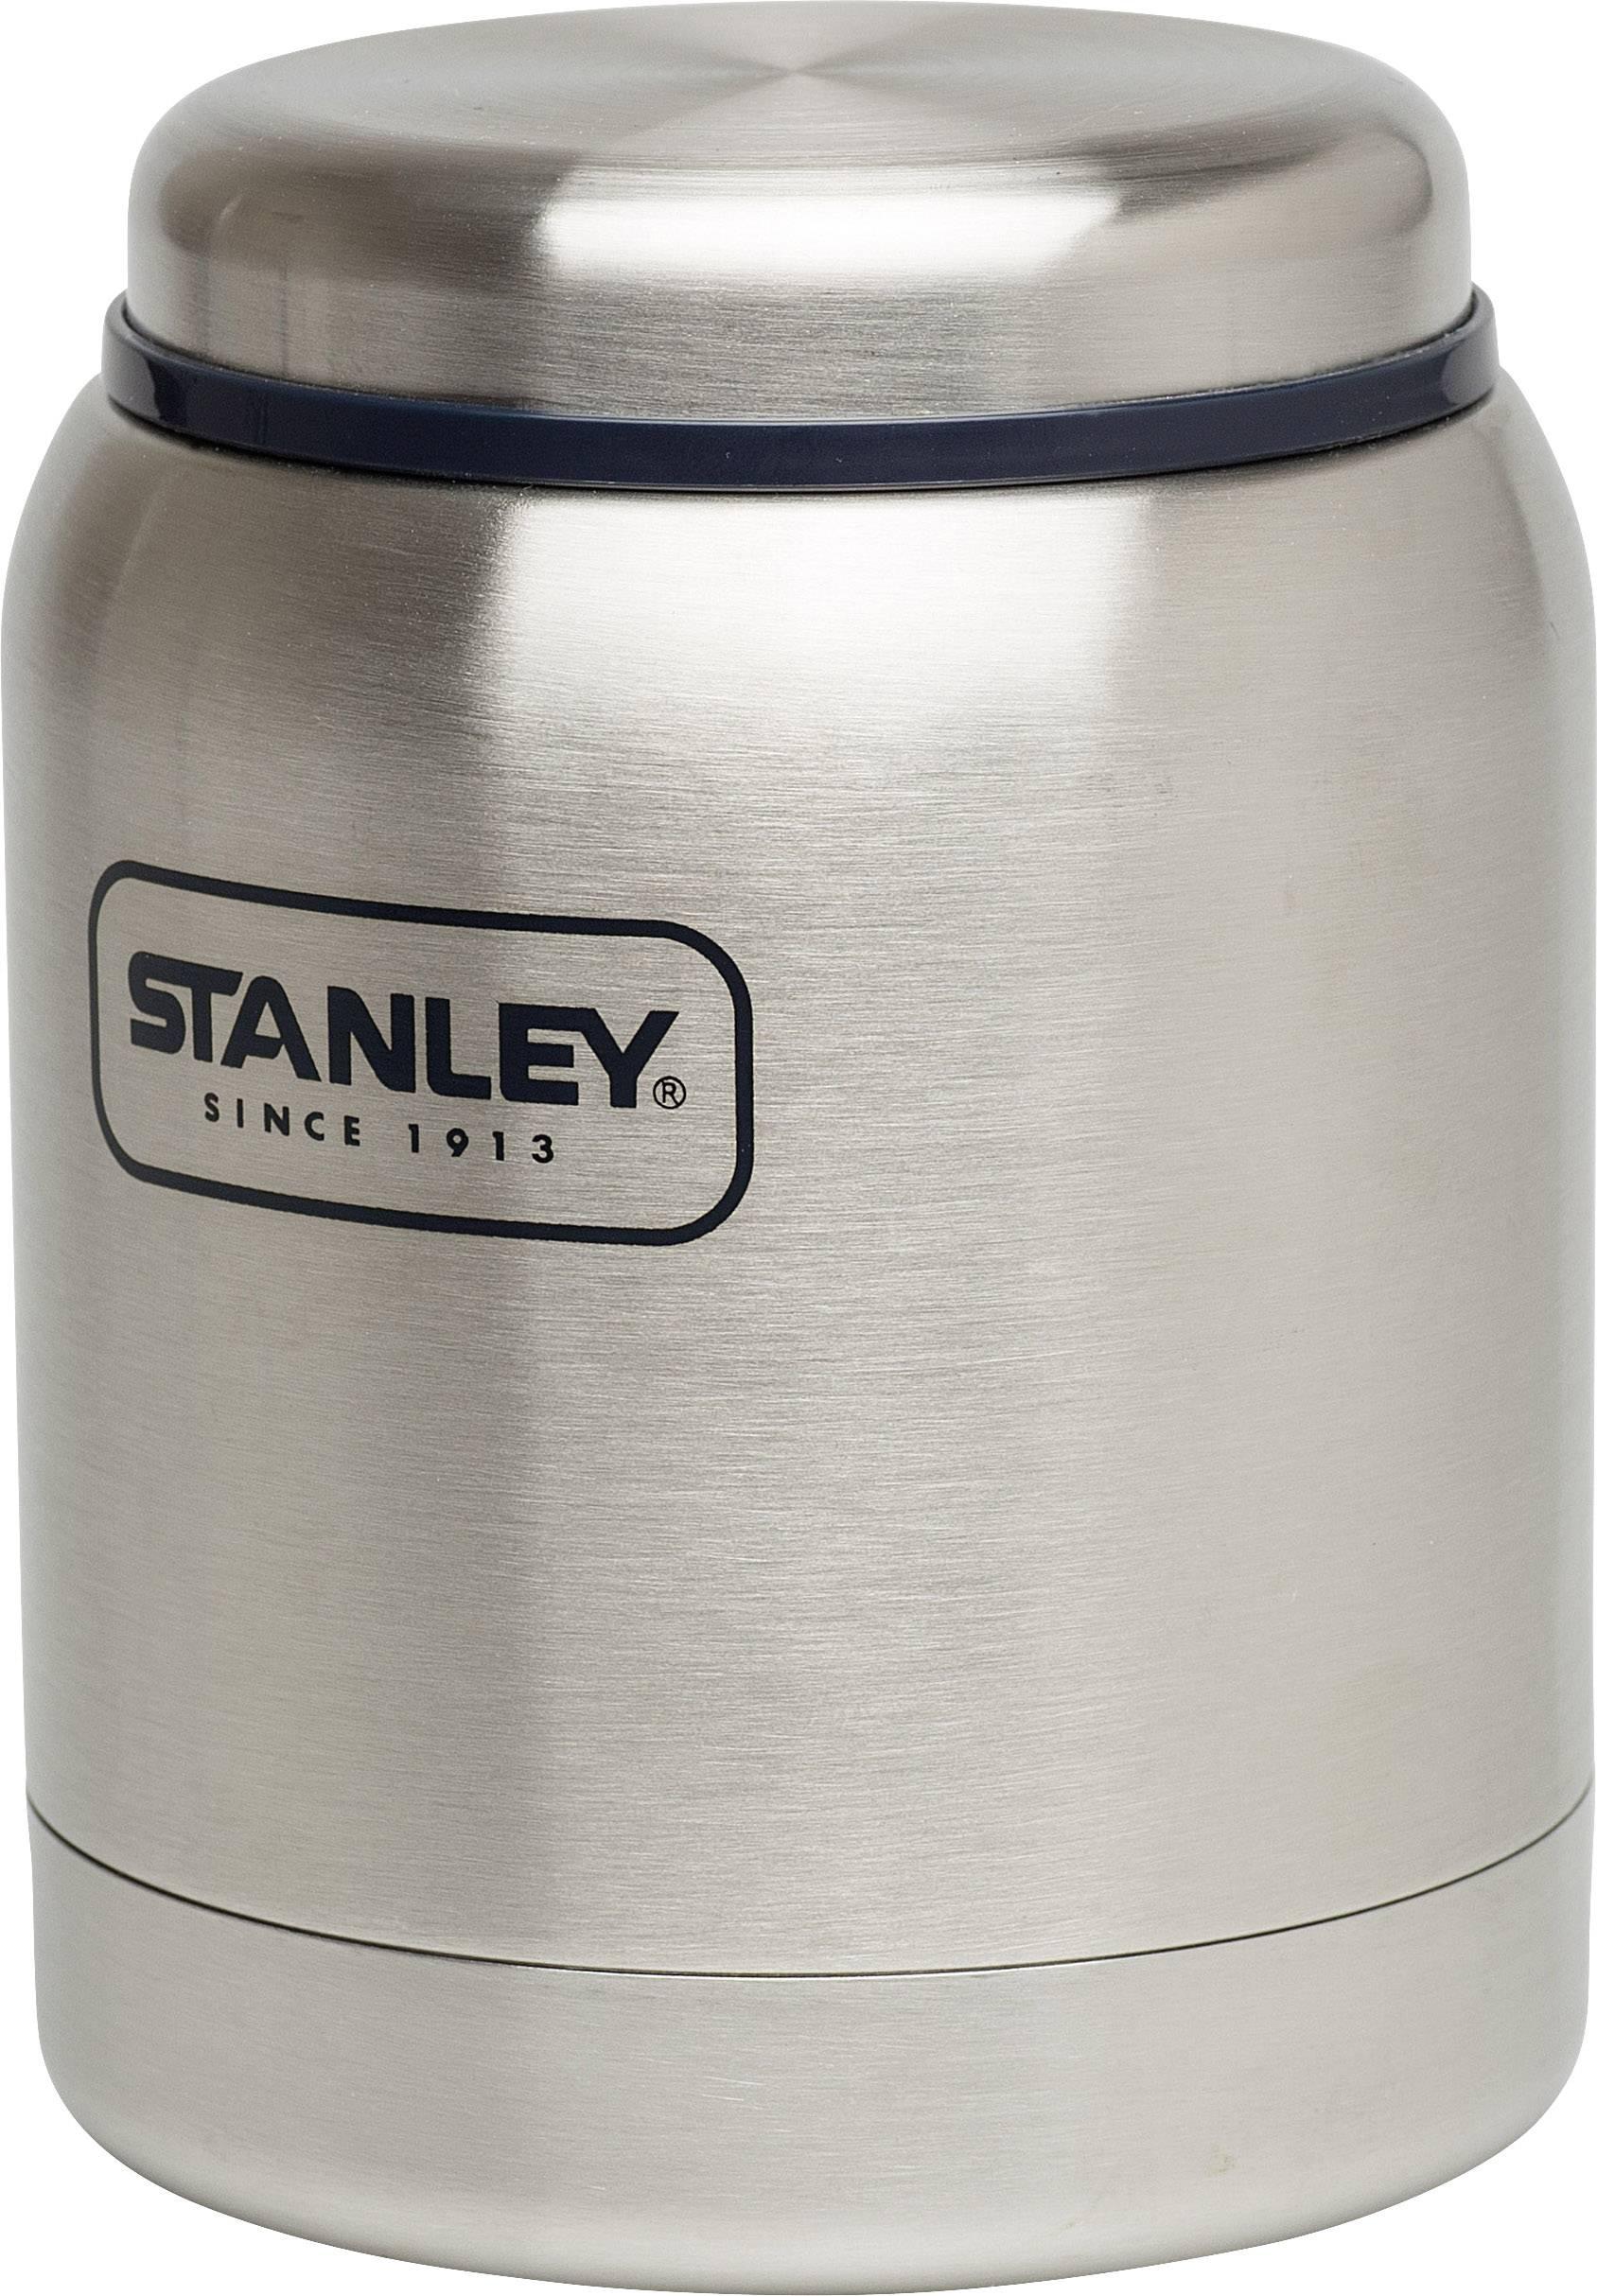 Kempingové nádoby na potraviny Stanley Adventure Food 400 ml 10-01610-002